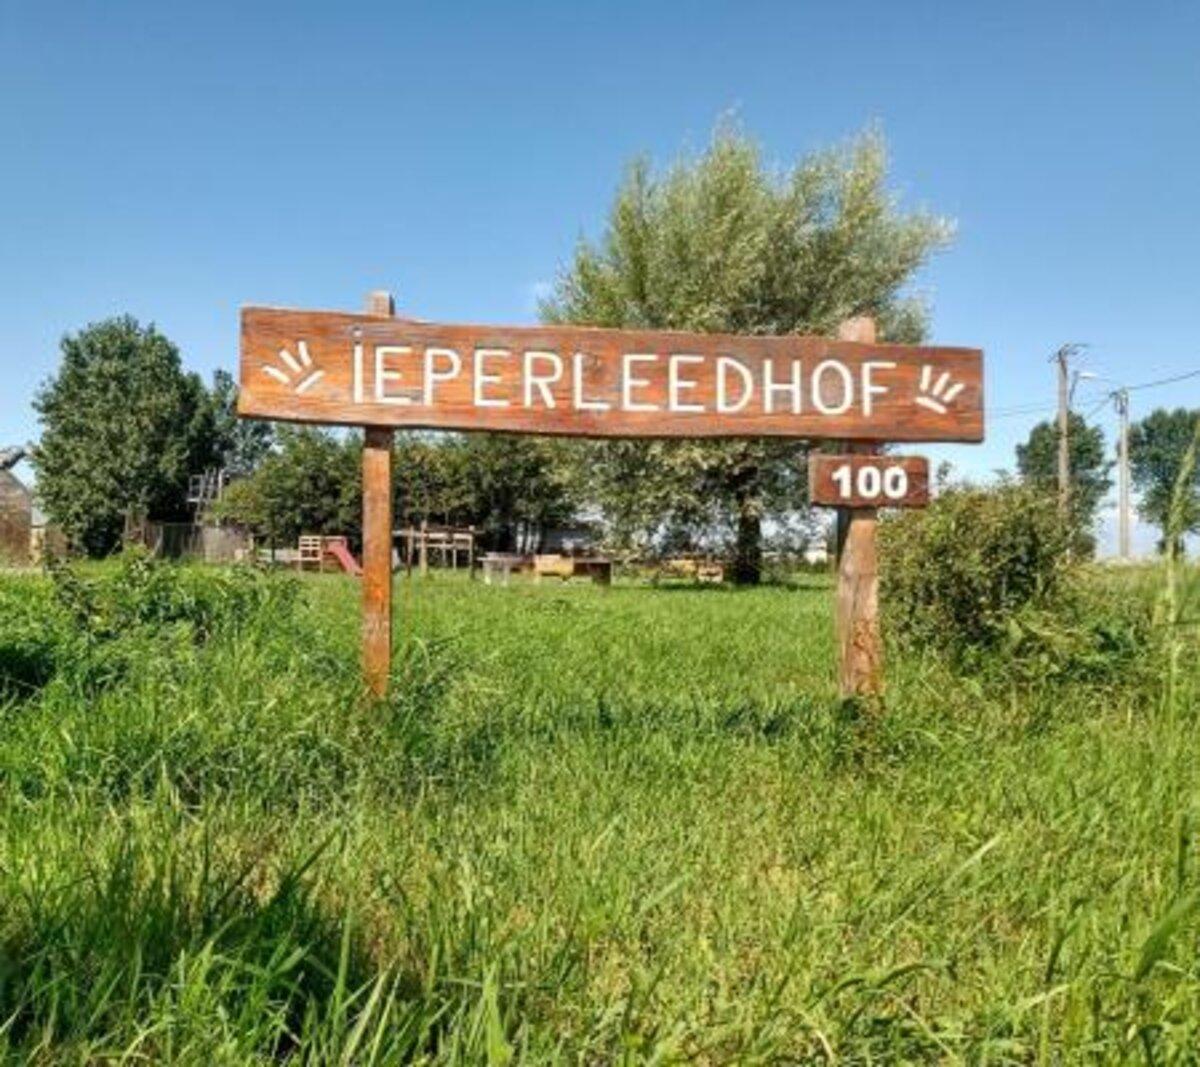 Ieperleedhof